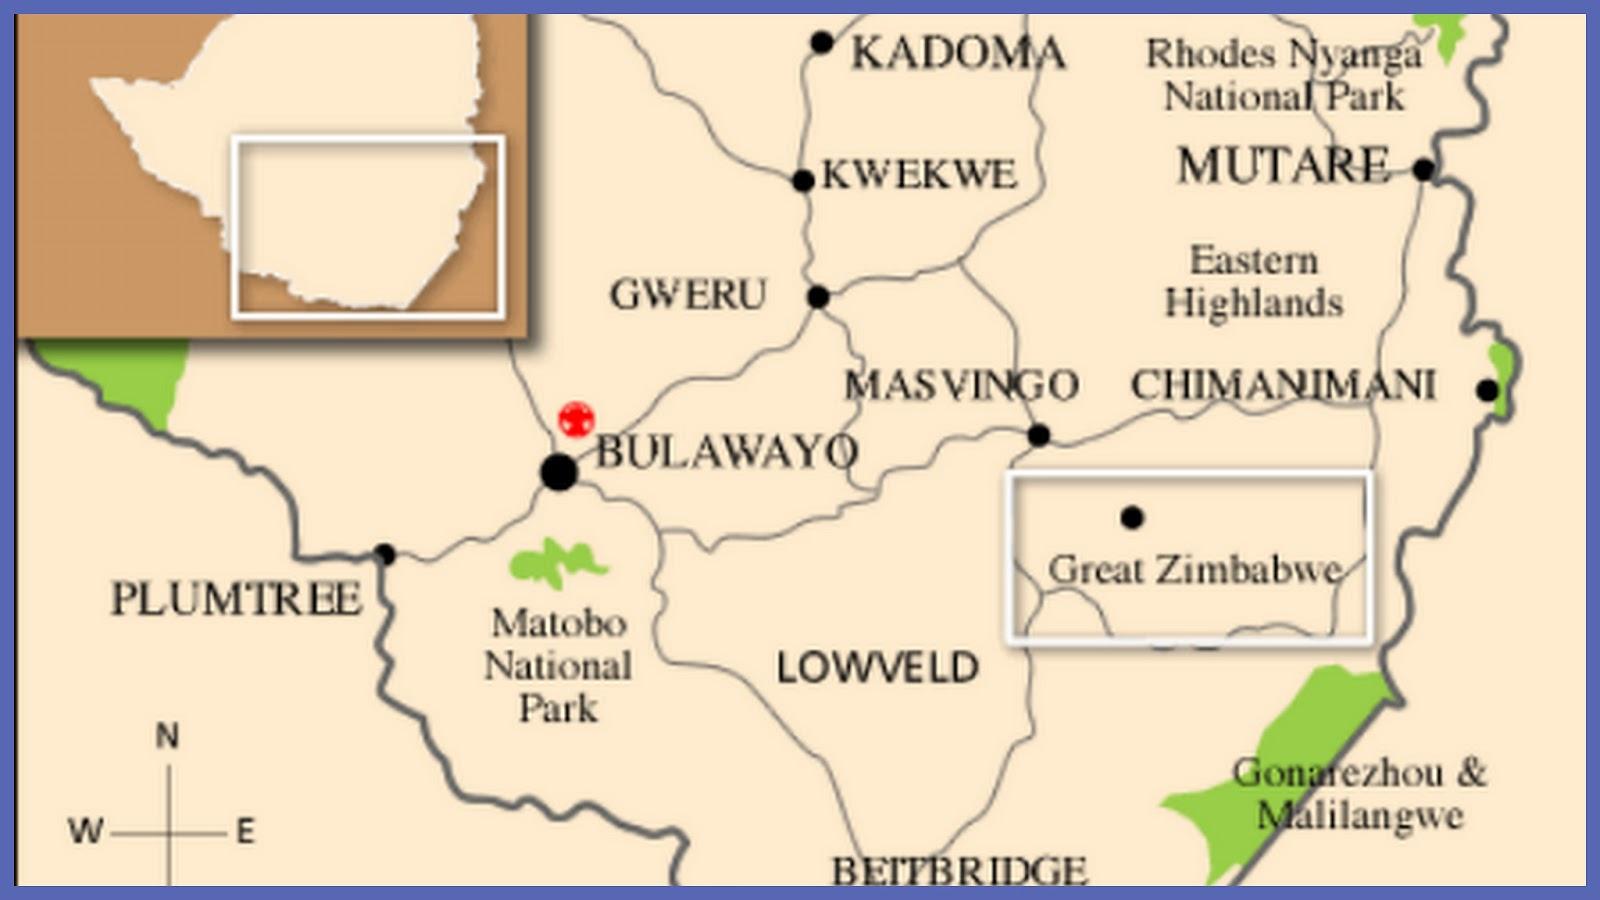 Great Zimbabwe World Map.Re Train Your Brain To Happiness Great Zimbabwe